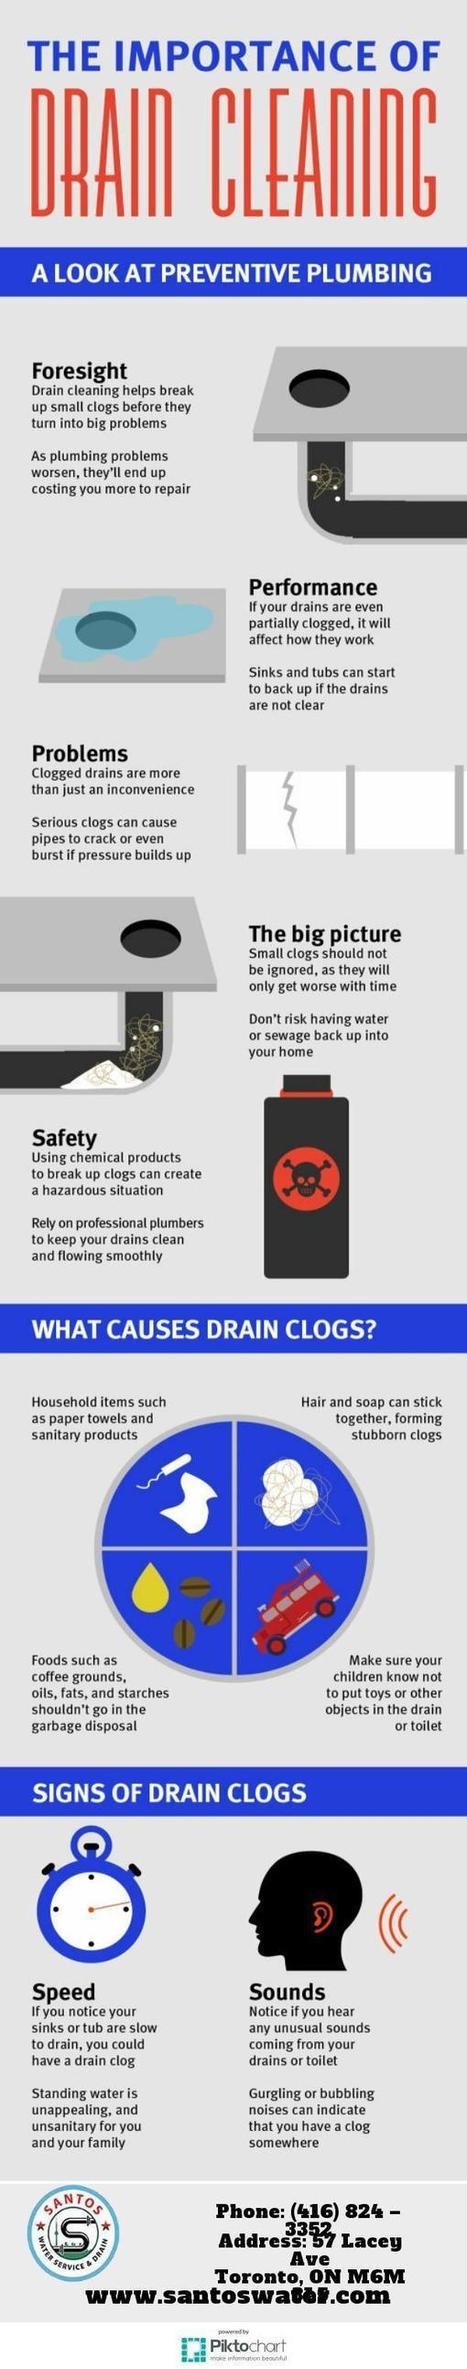 The Importance Of Drain Cleaning | Toronto Plumbing Repair | Scoop.it